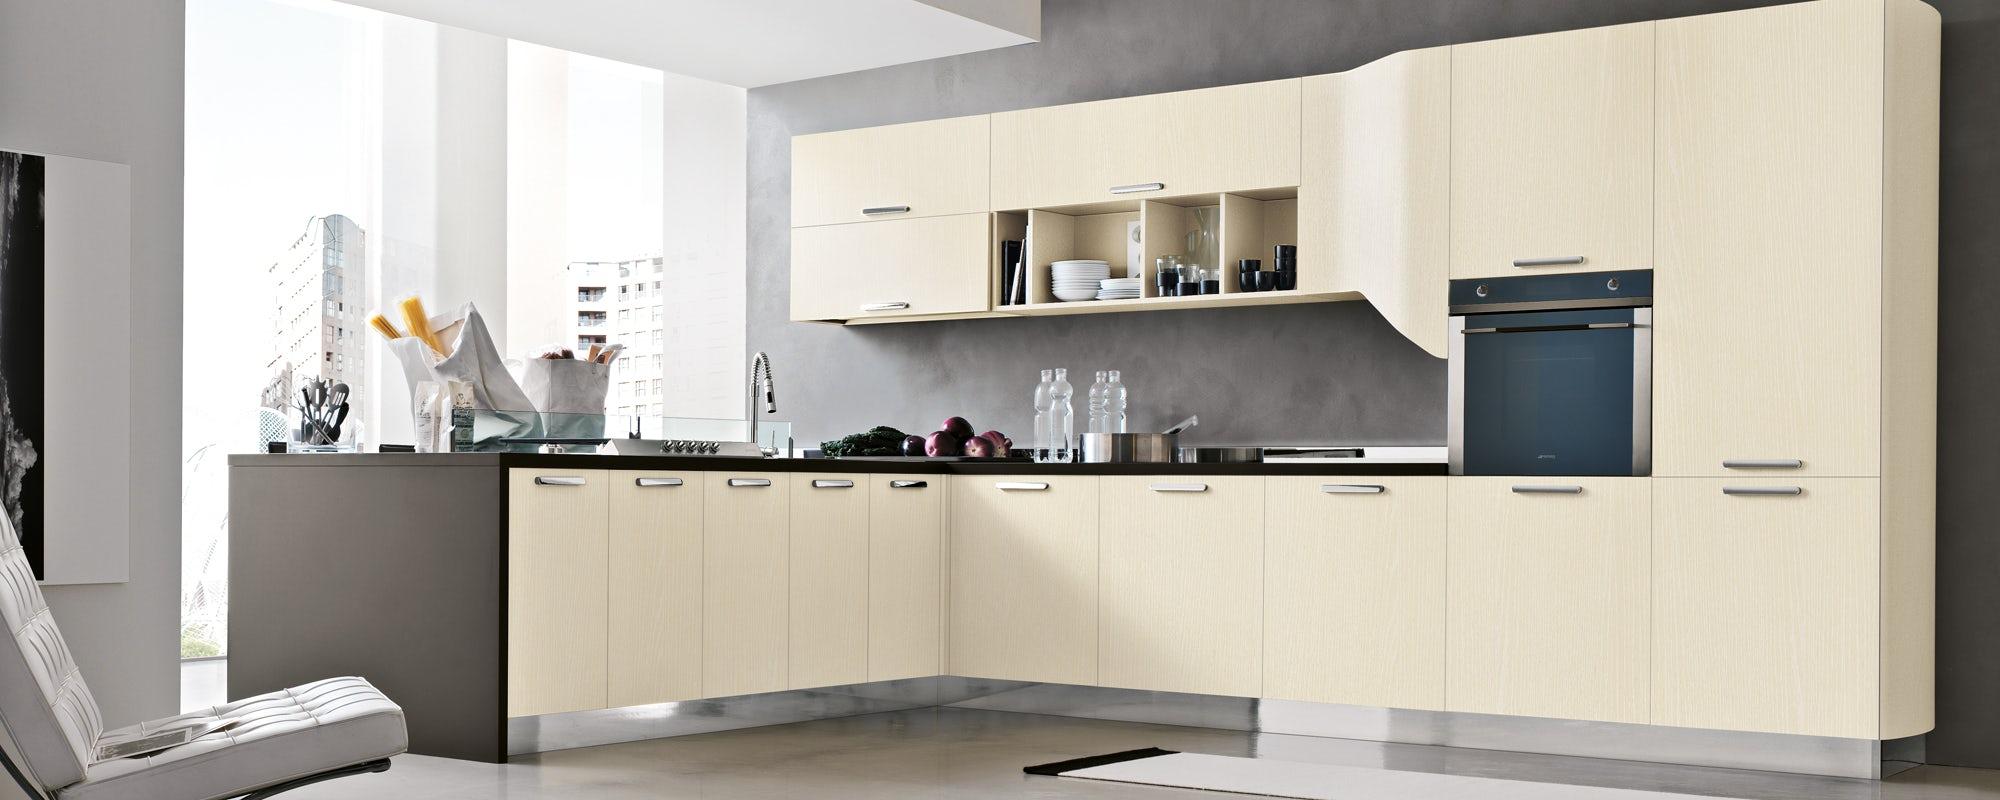 Cucina Stosa Milly - Stefano Arredamenti